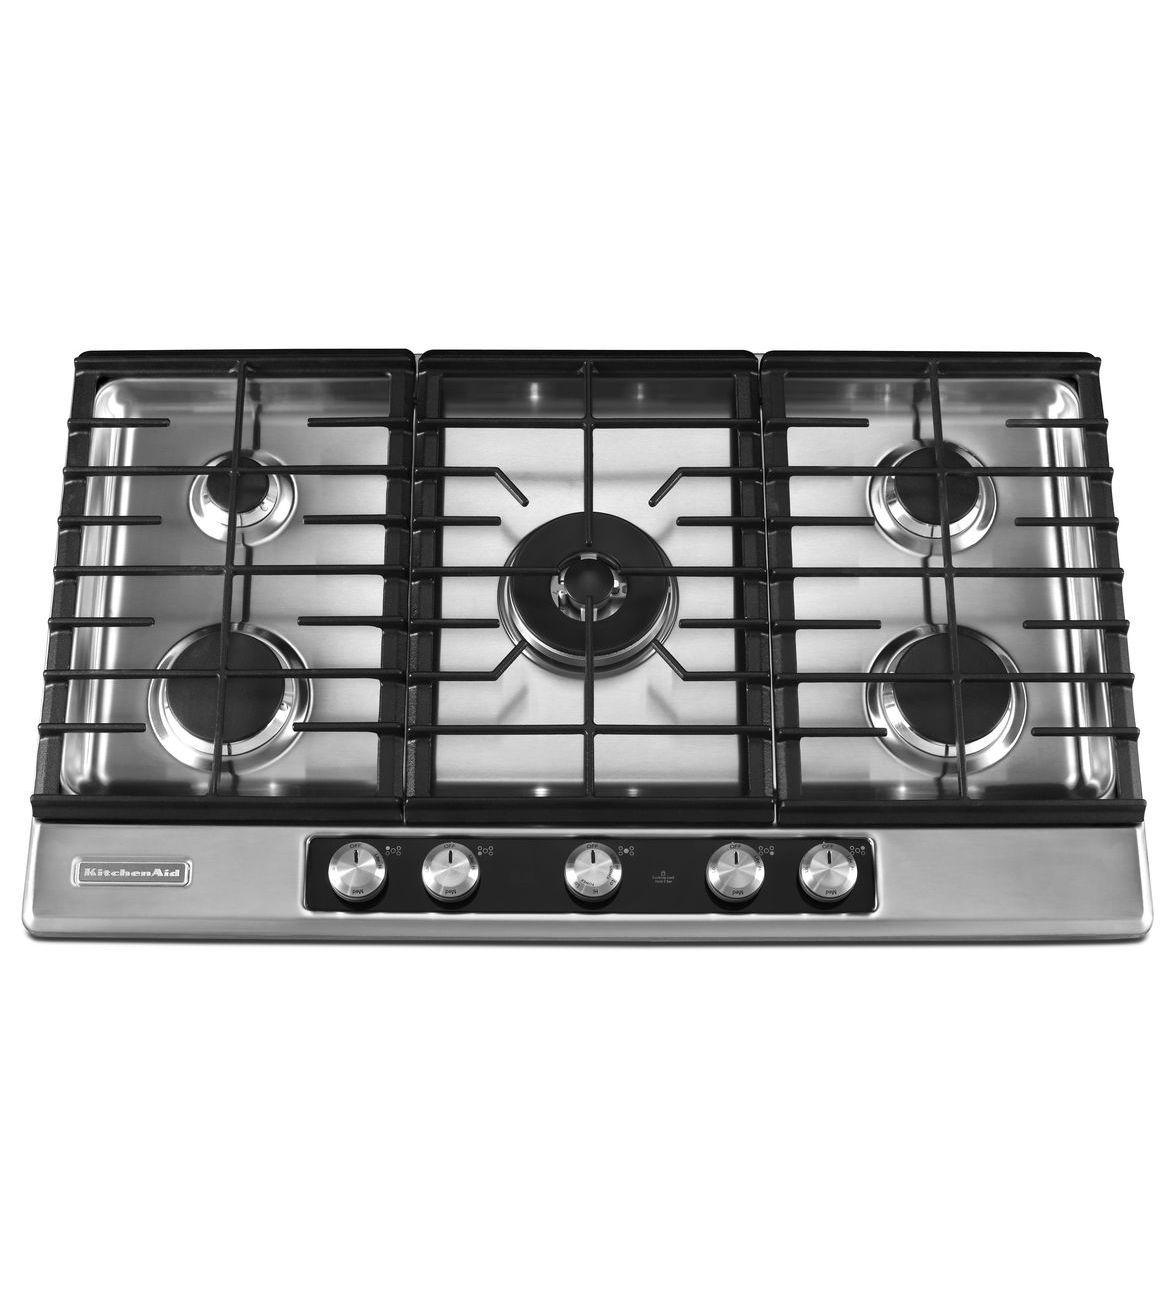 Kitchenaid 36 Gas Cooktop